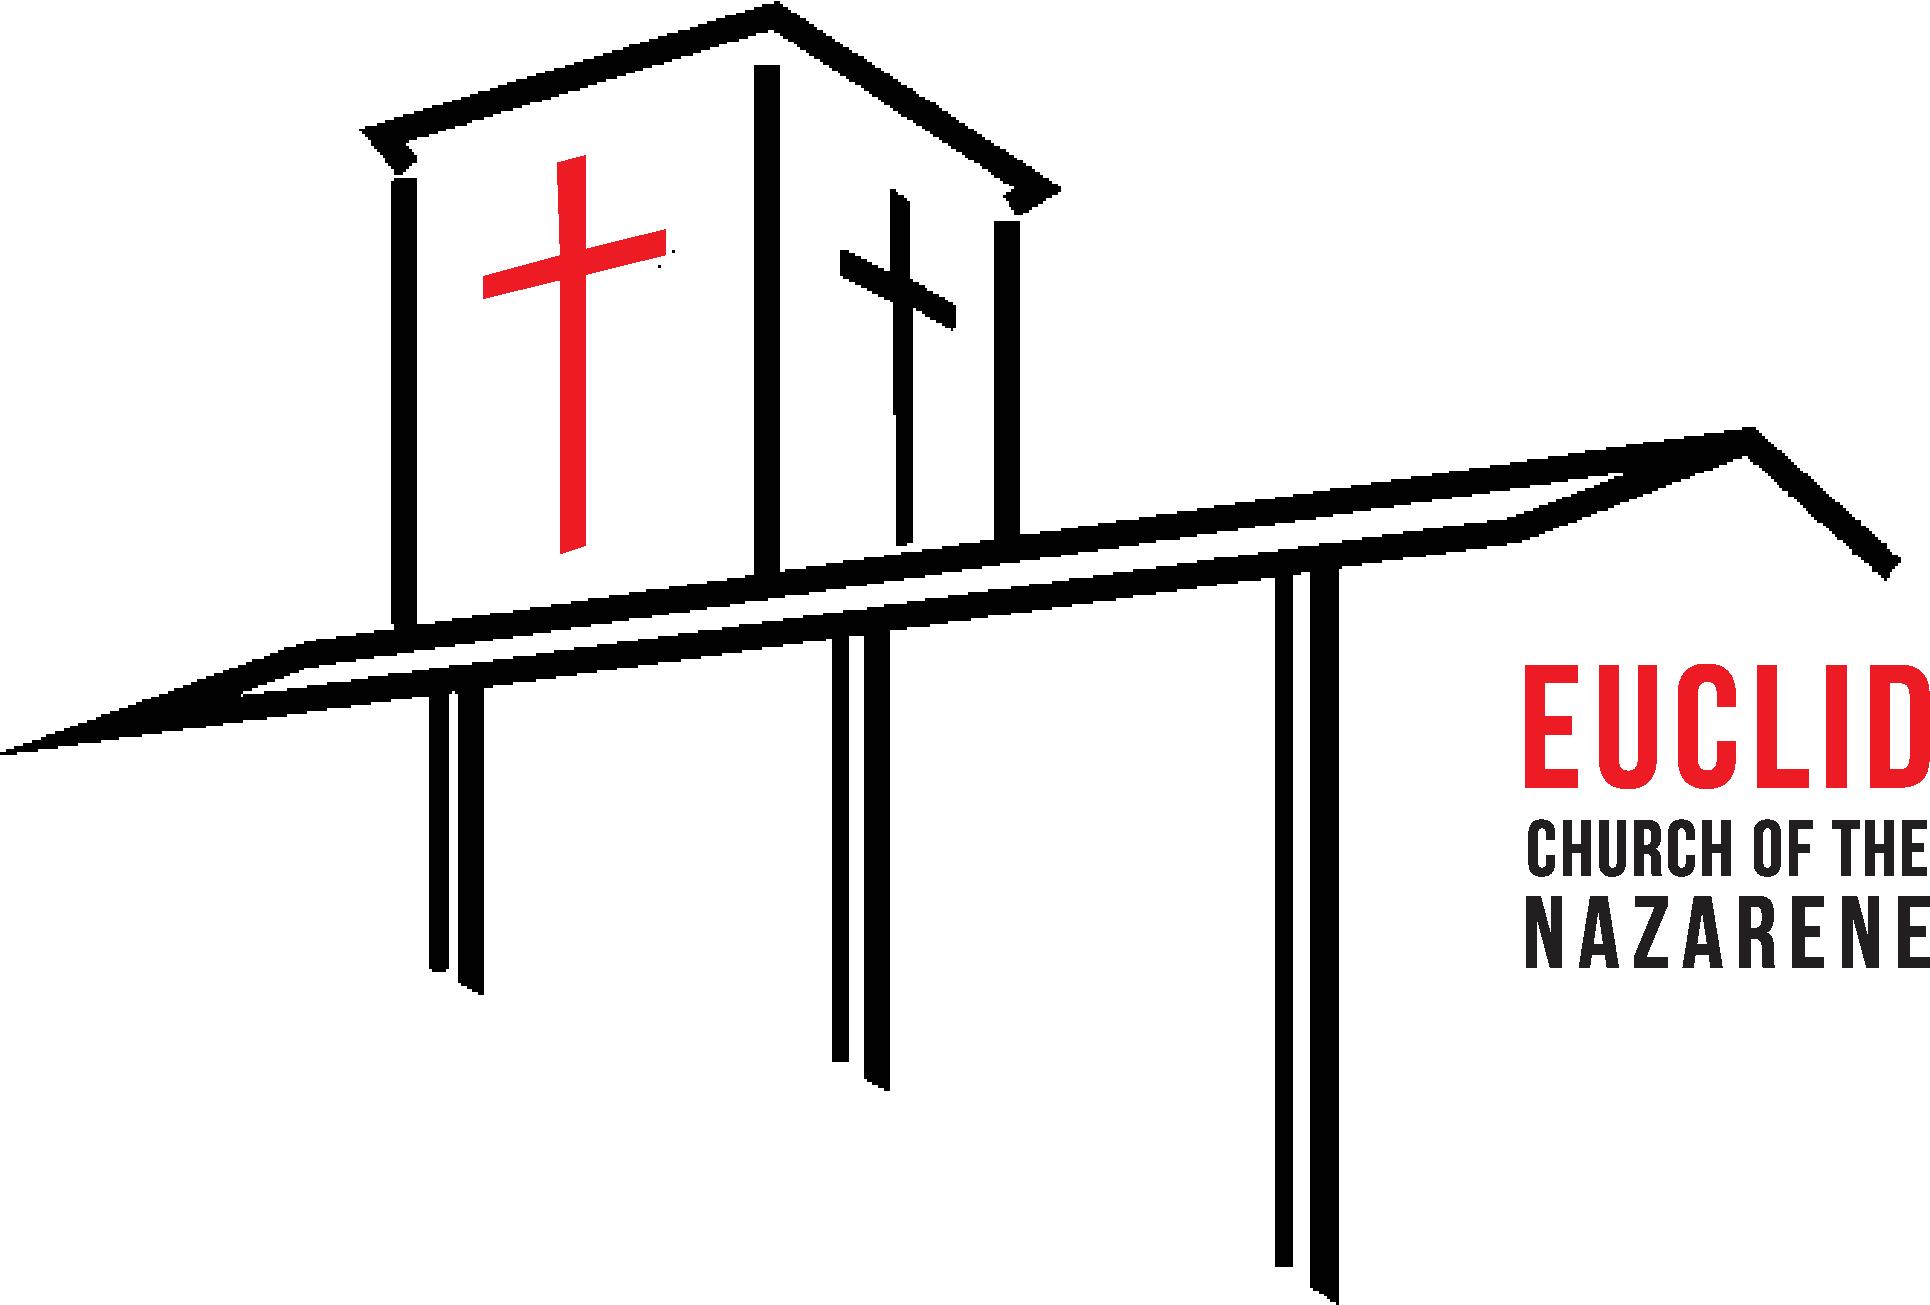 Euclid Avenue Church of the Nazarene | - Church in Boise, ID